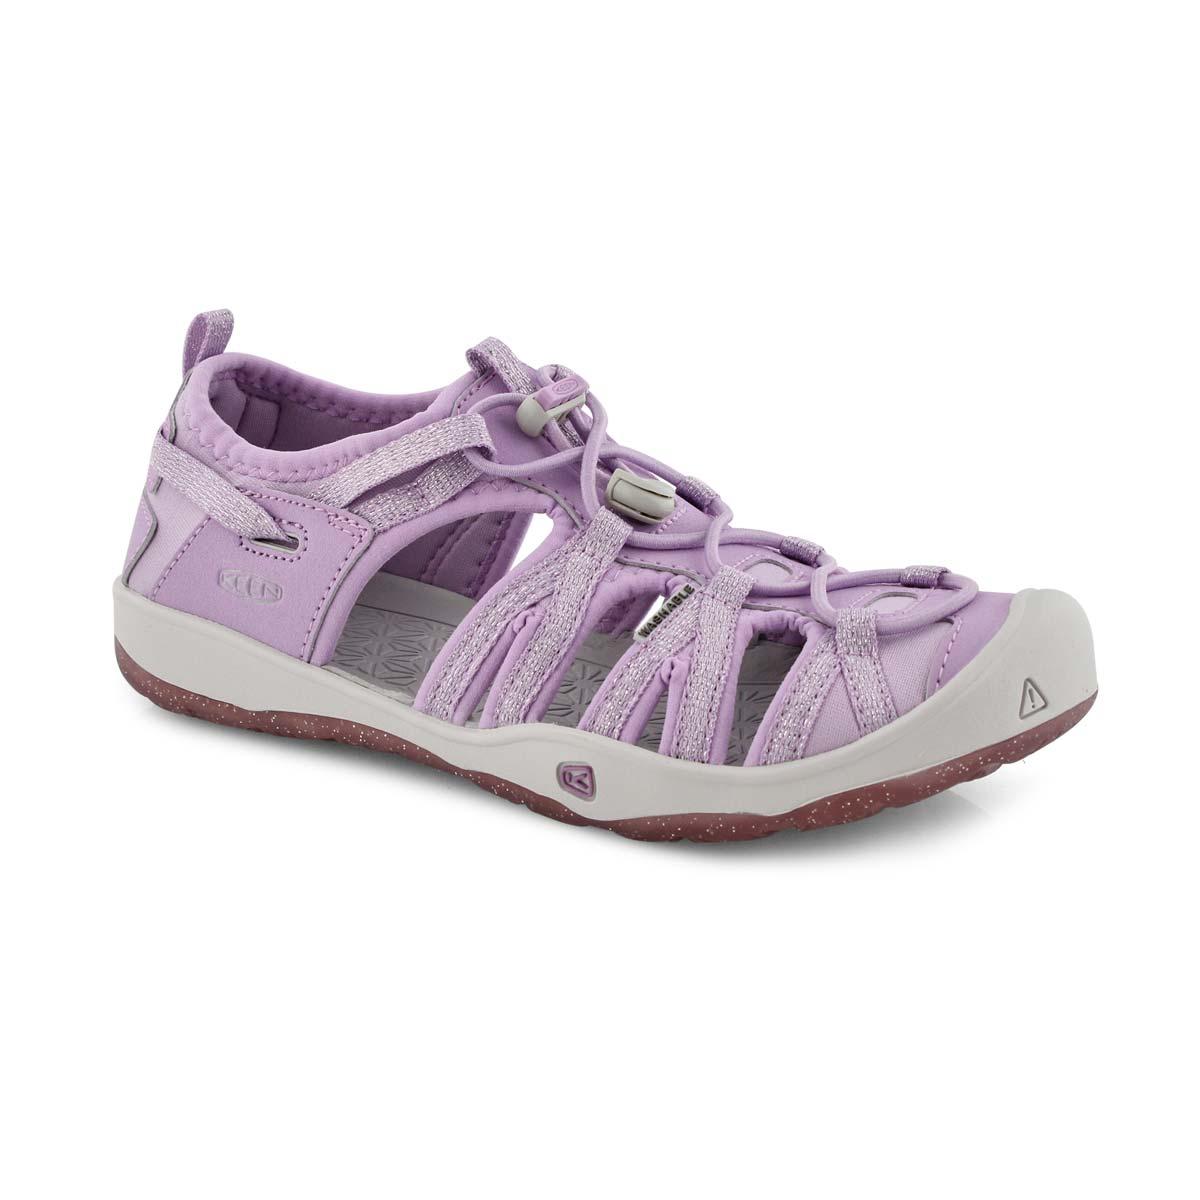 Grls Moxie lupine sport sandal